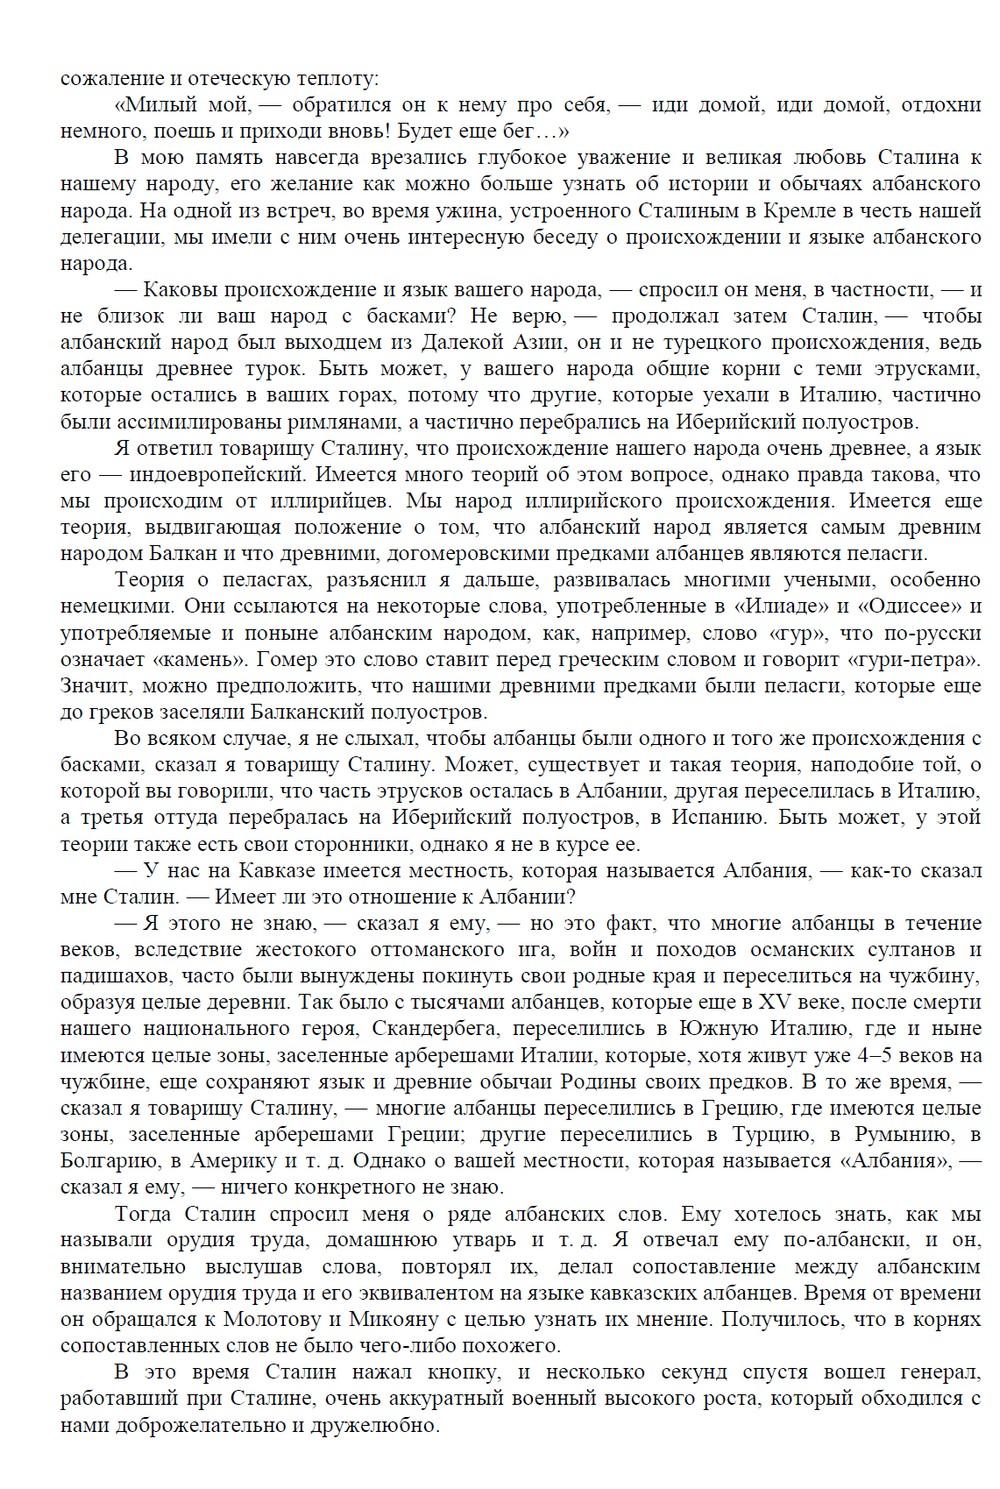 http://i6.imageban.ru/out/2013/11/29/9d138a9b6127419e3b8567391806ae94.jpg